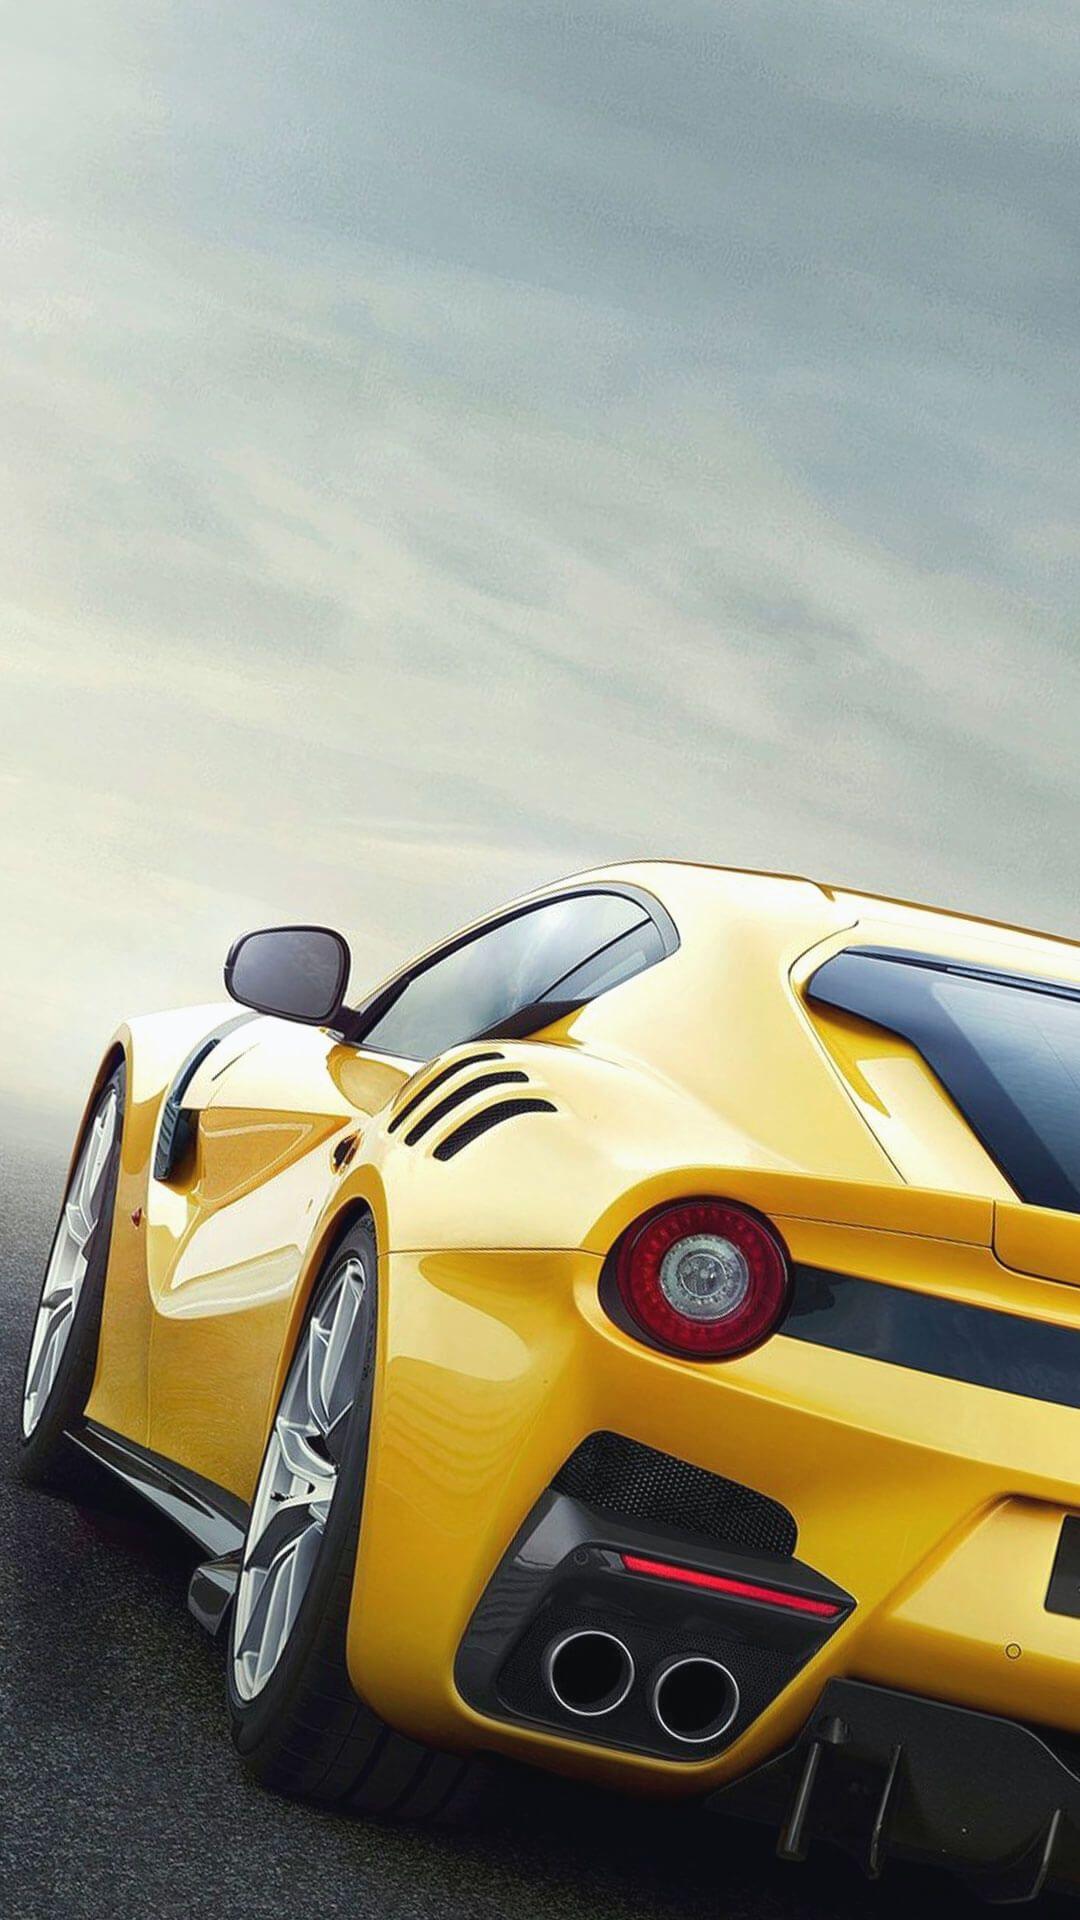 Pin oleh Akshay Poduvattil di Automotive di 2020 Mobil